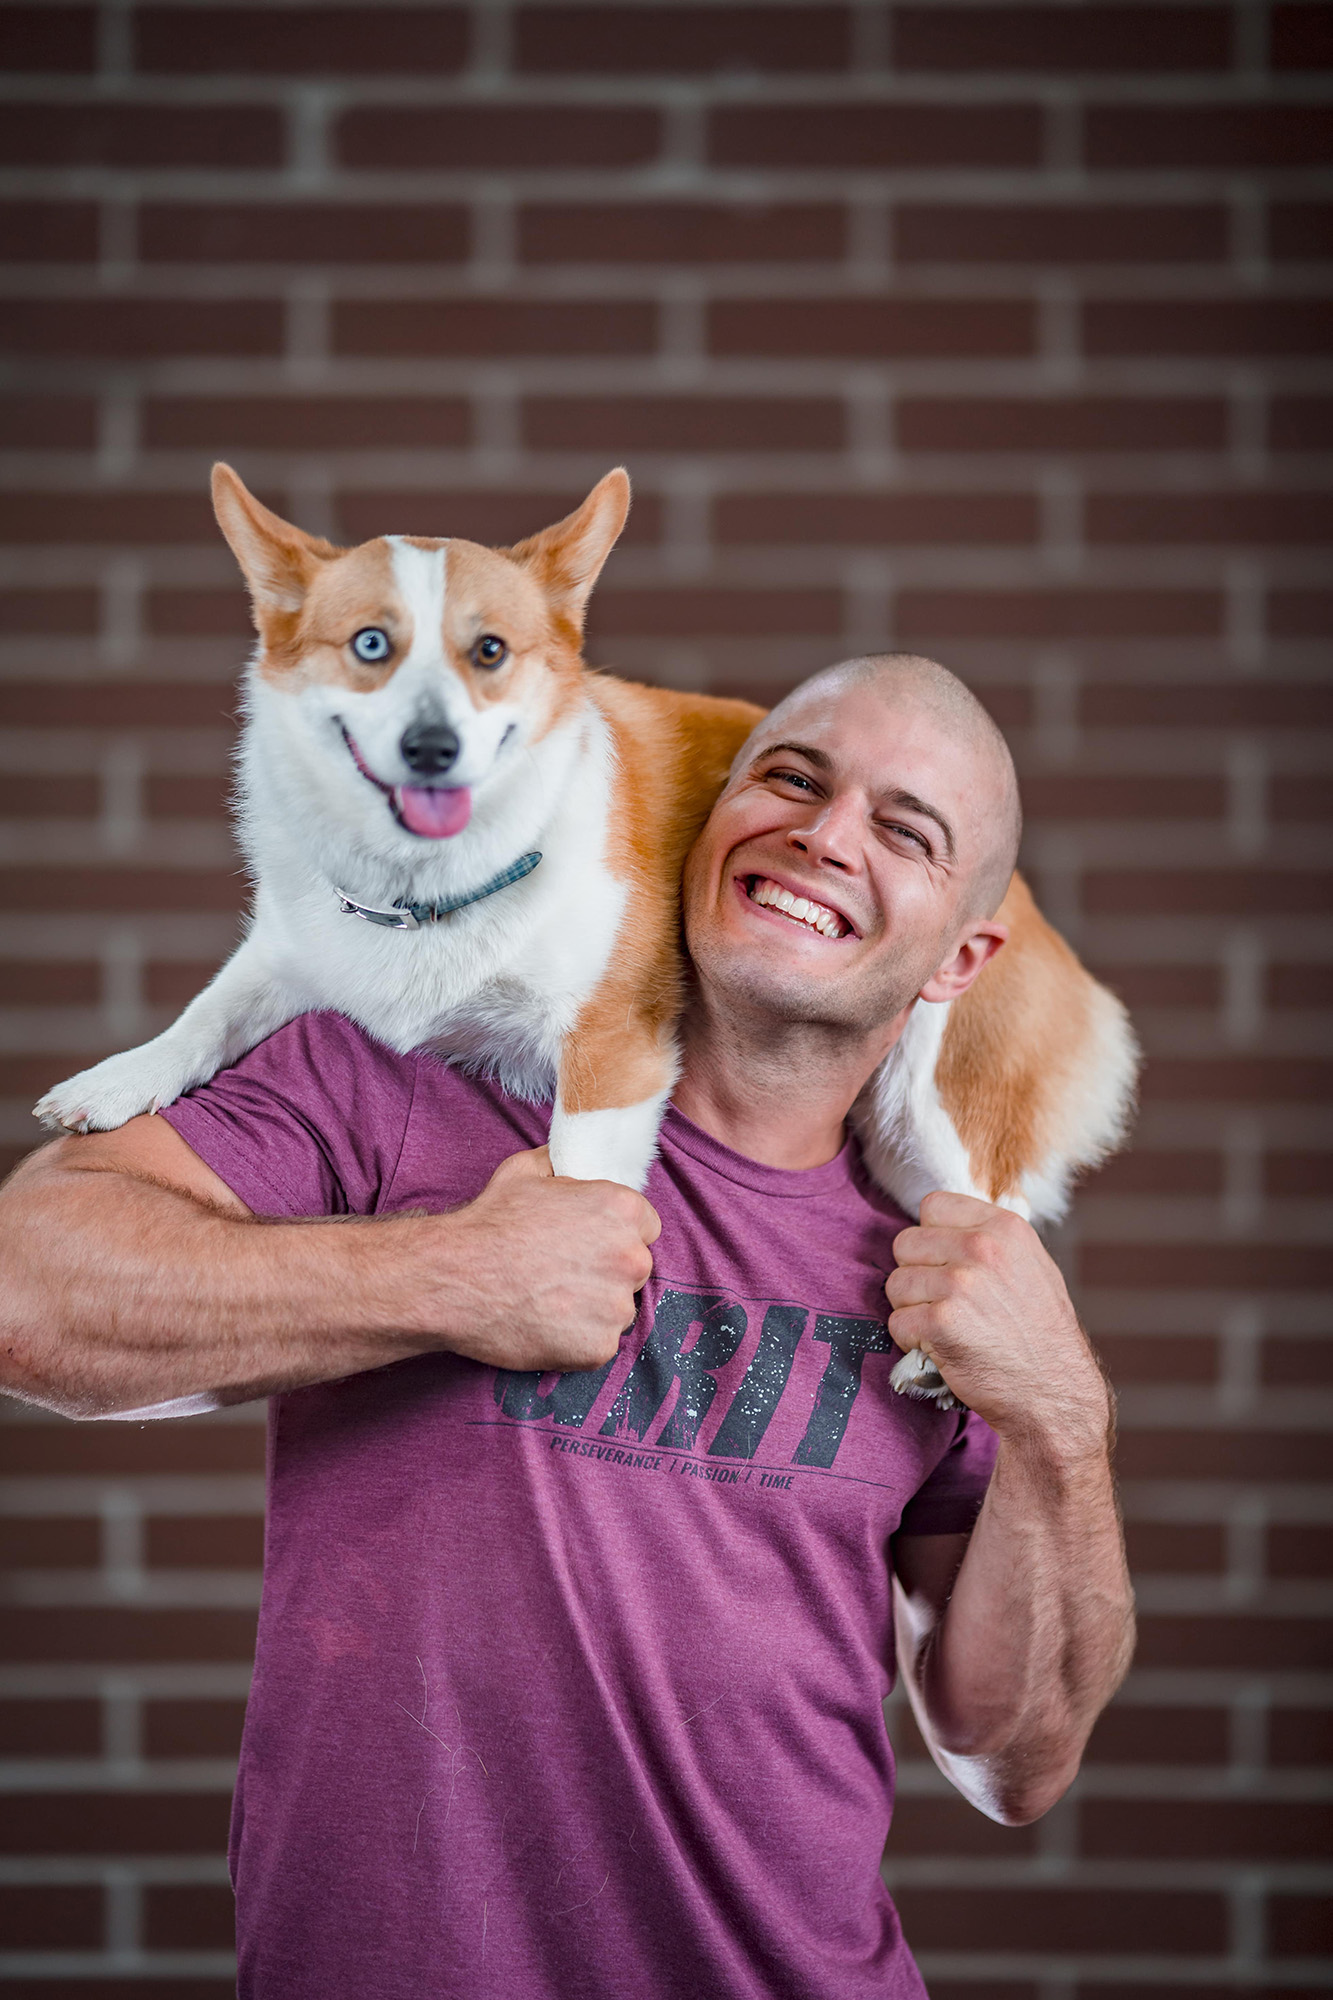 man holding dog talking about strength training program